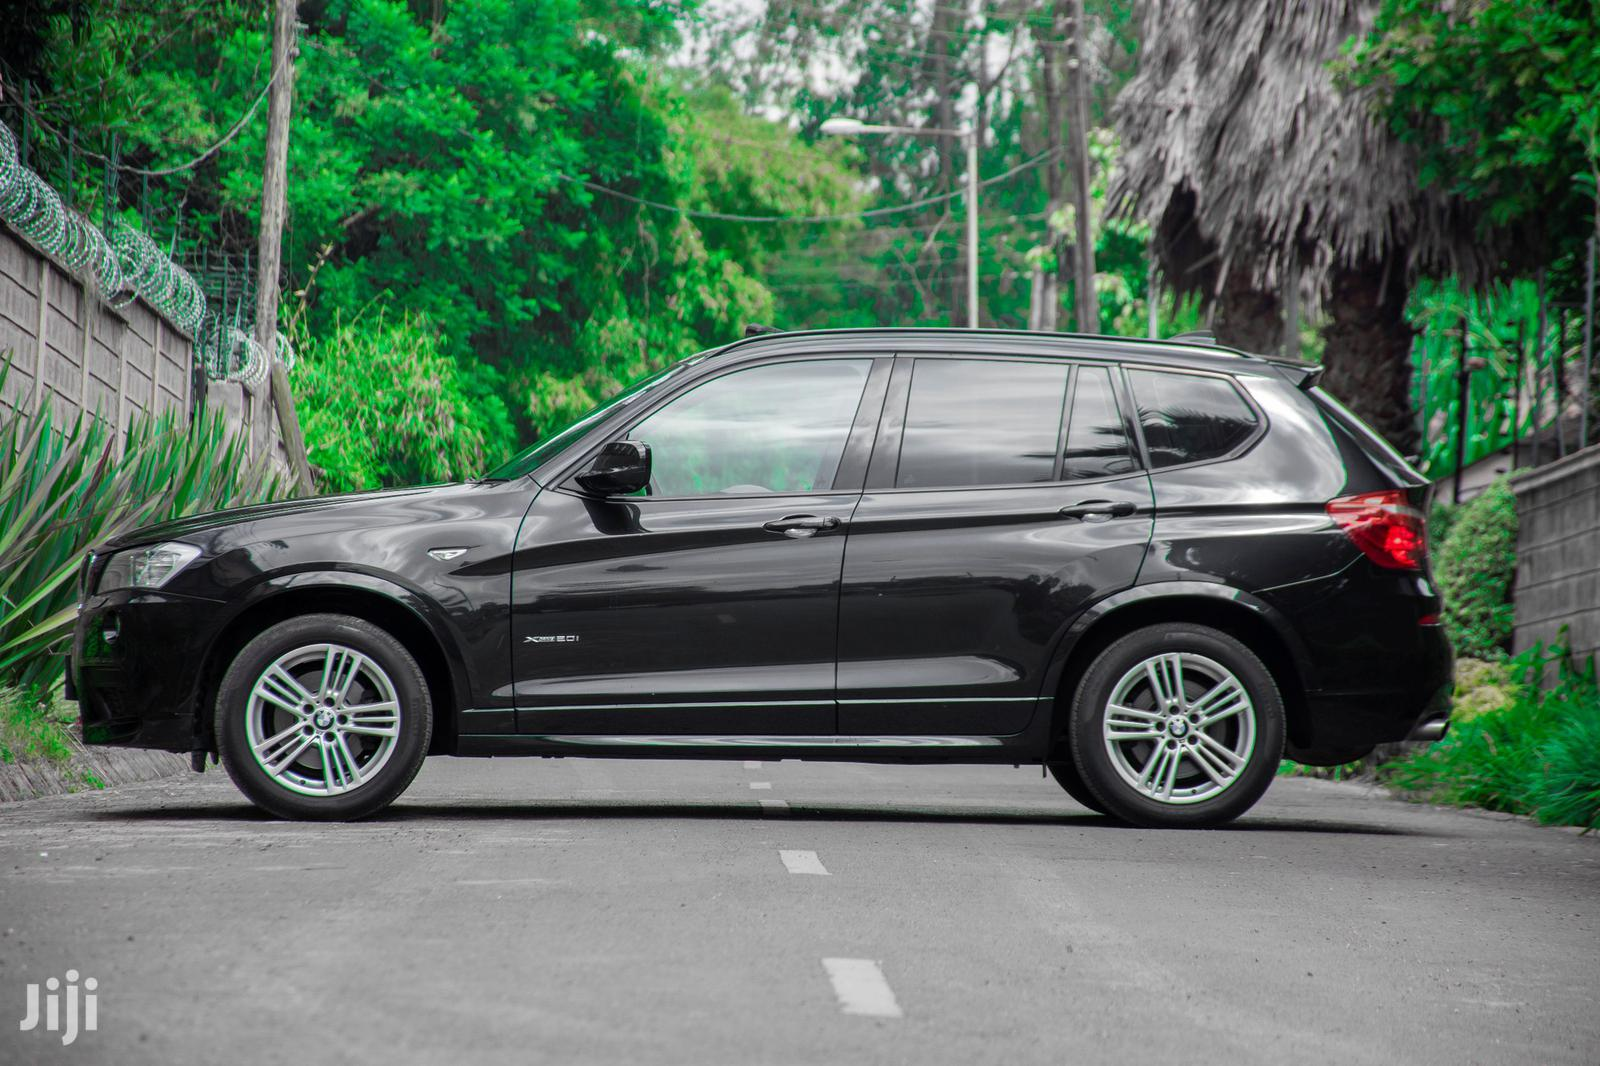 Archive: BMW X3 2013 xDrive28i Black